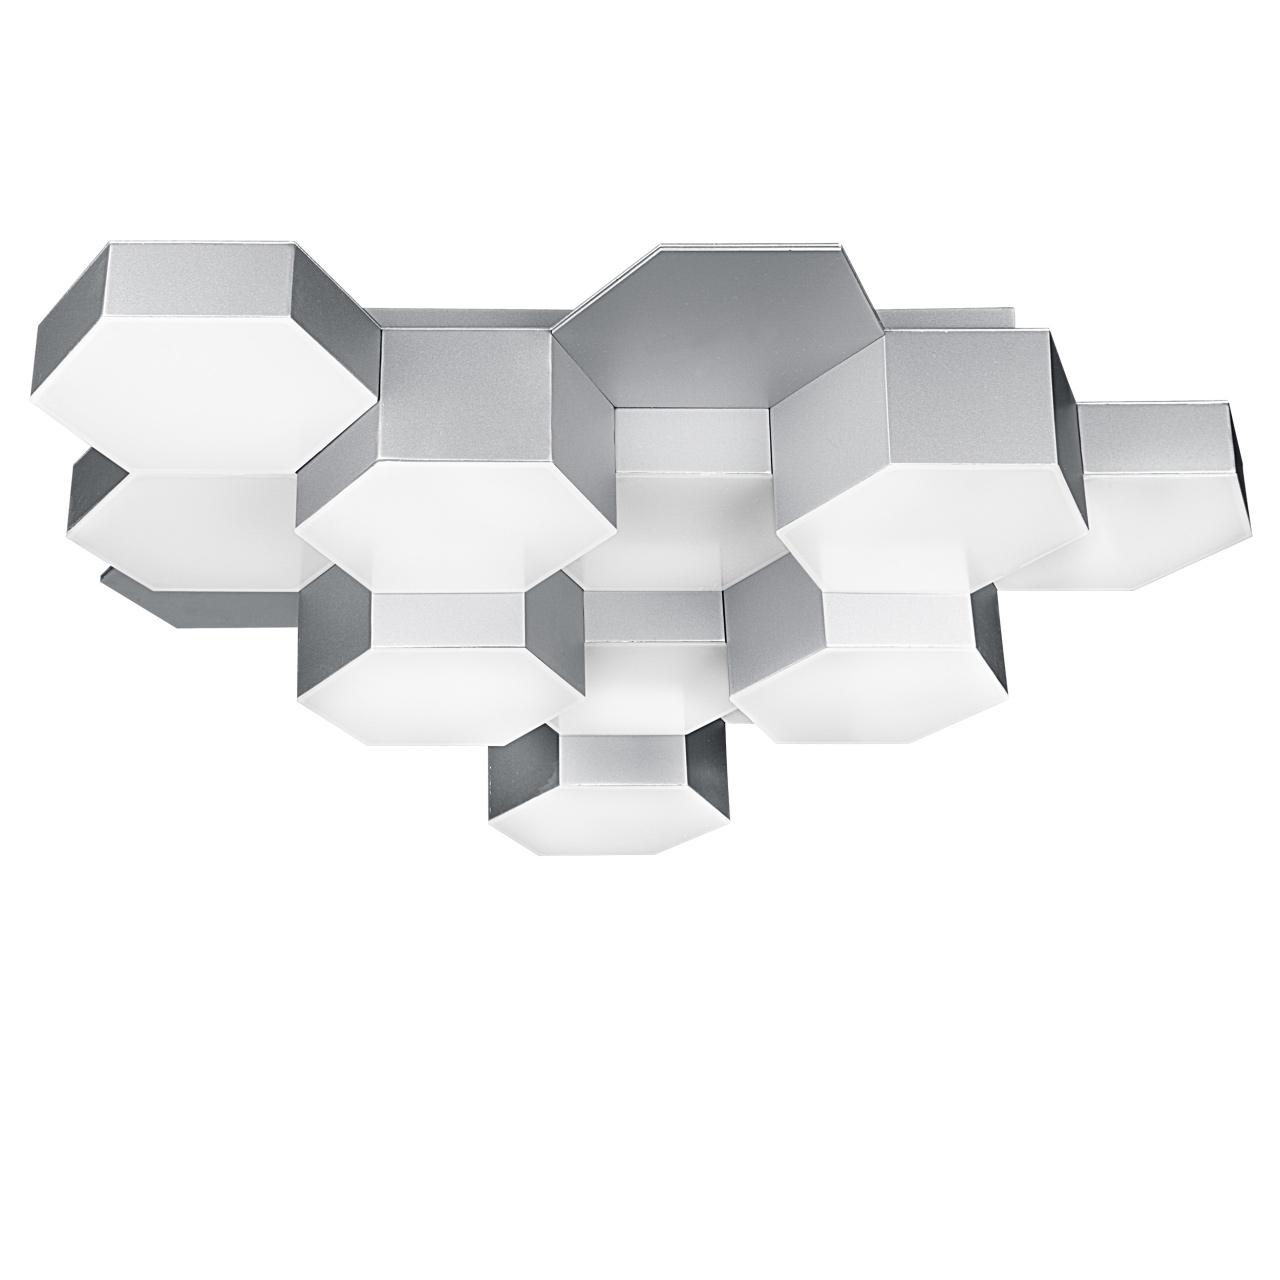 Люстра потолочная Favo LED-60W 2880LM silver 4000K Lightstar 750124